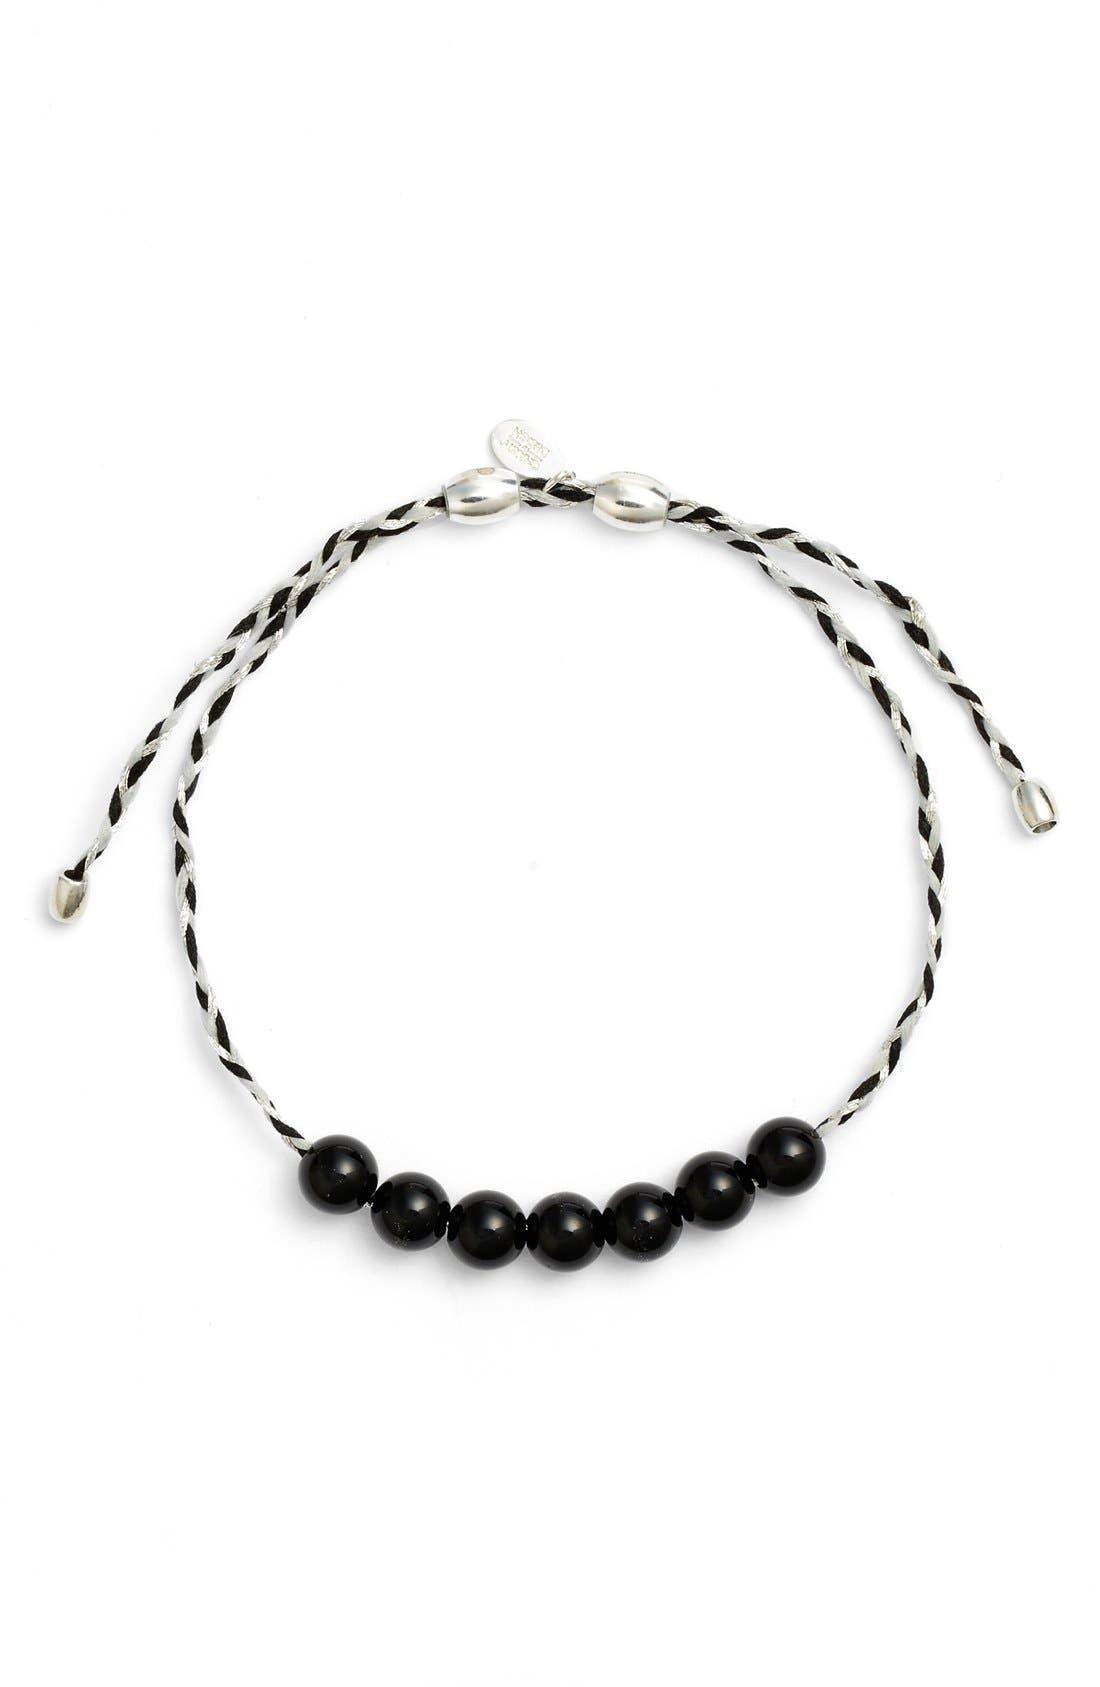 Alternate Image 1 Selected - Alex and Ani 'Earth Precious' Thread Bracelet